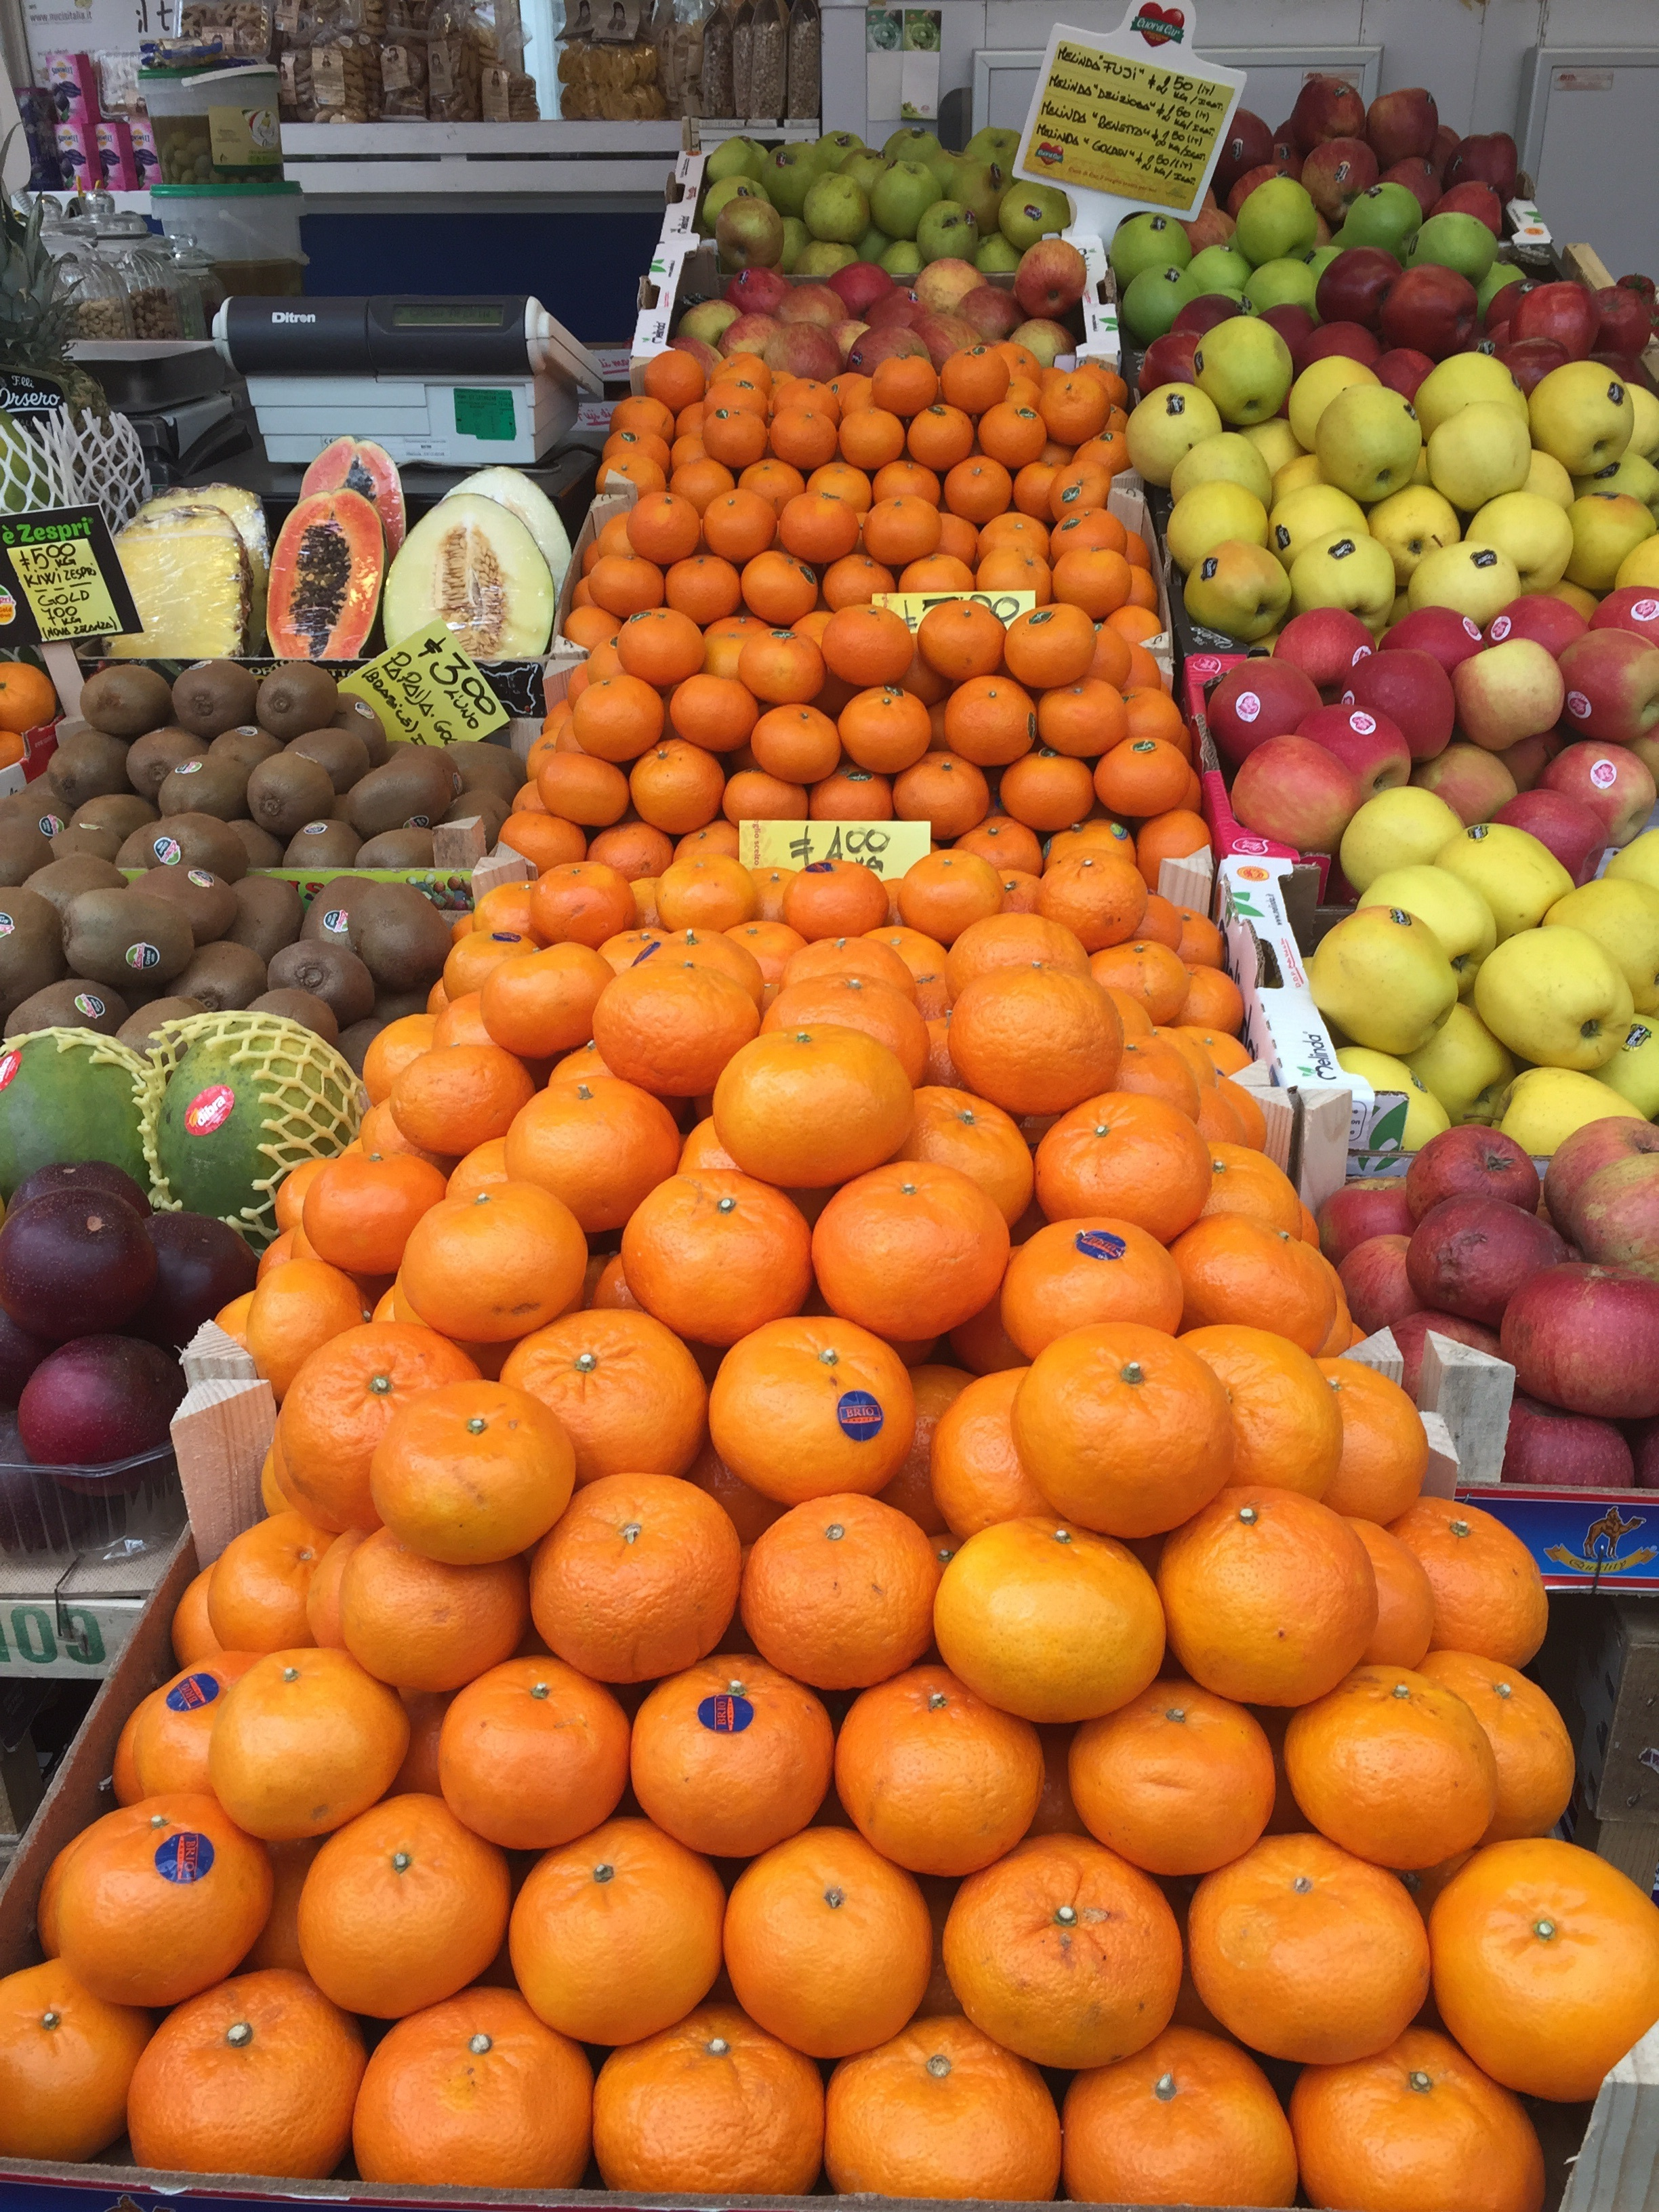 Oranges at a market.